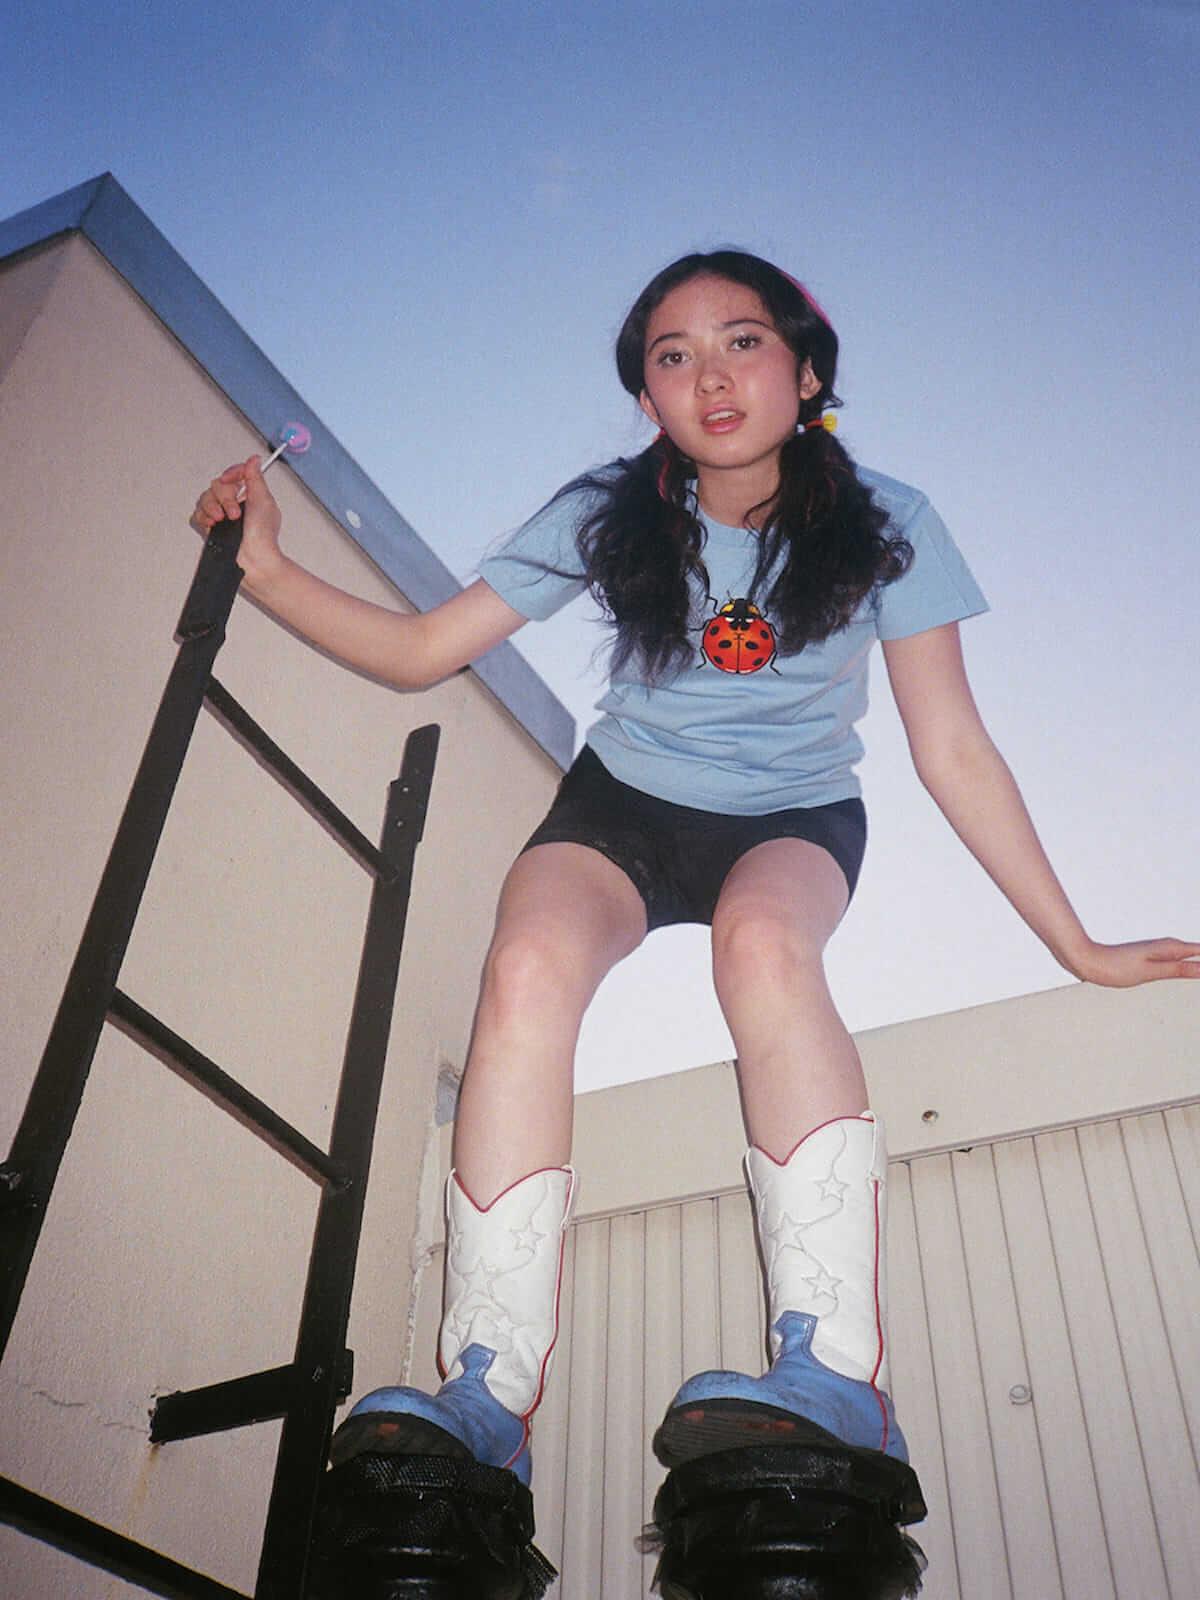 X-girl×ヴァナ・ヤングスタイン ガーリーなオリジナルプリントの入った初コラボTシャツが登場! lifefashion180619_X-girl_onitsuka_08-1200x1600